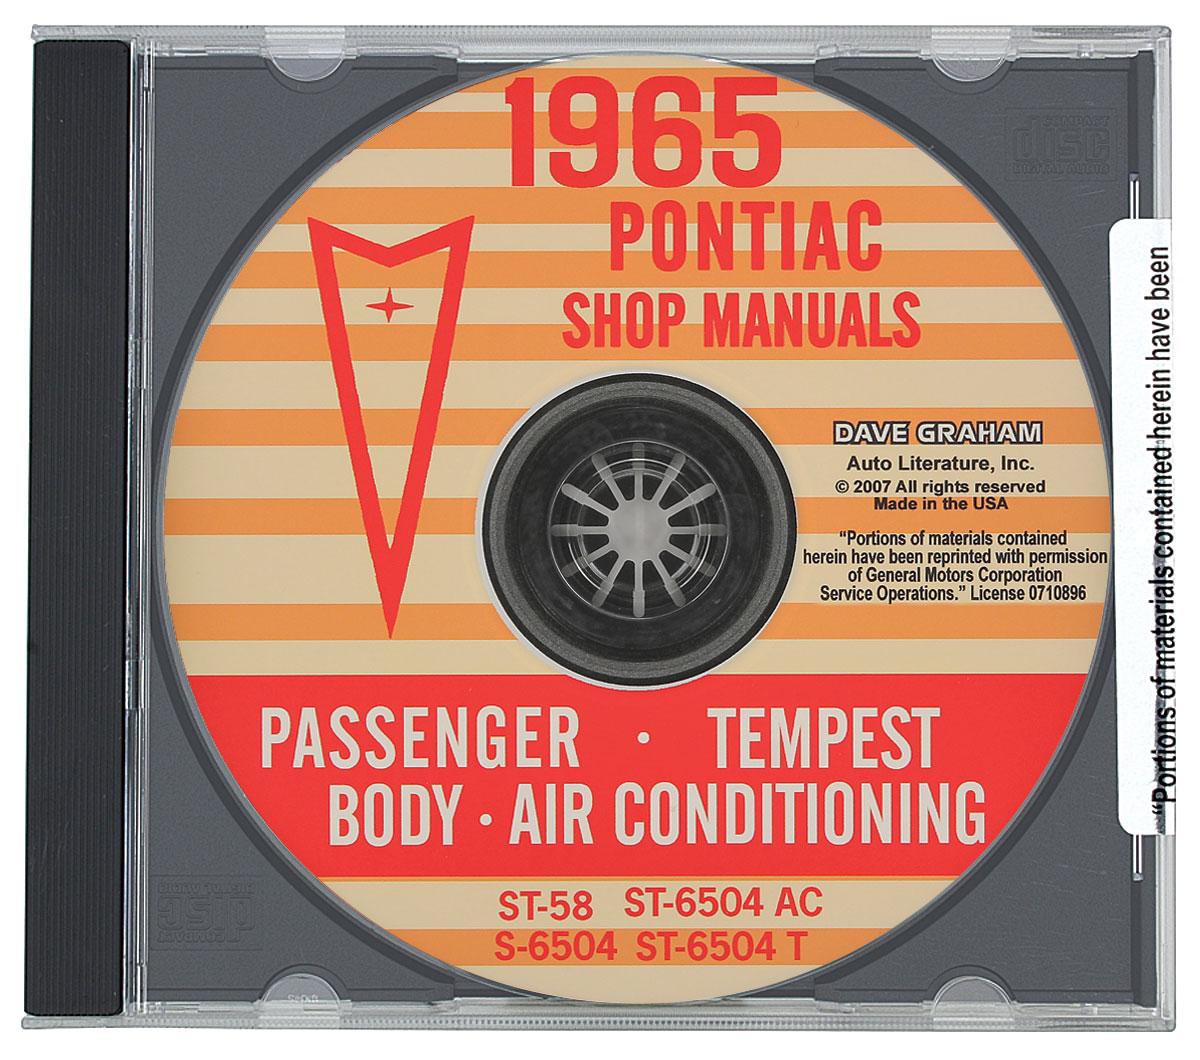 Factory Manuals, CD-ROM, 1965 Pontiac